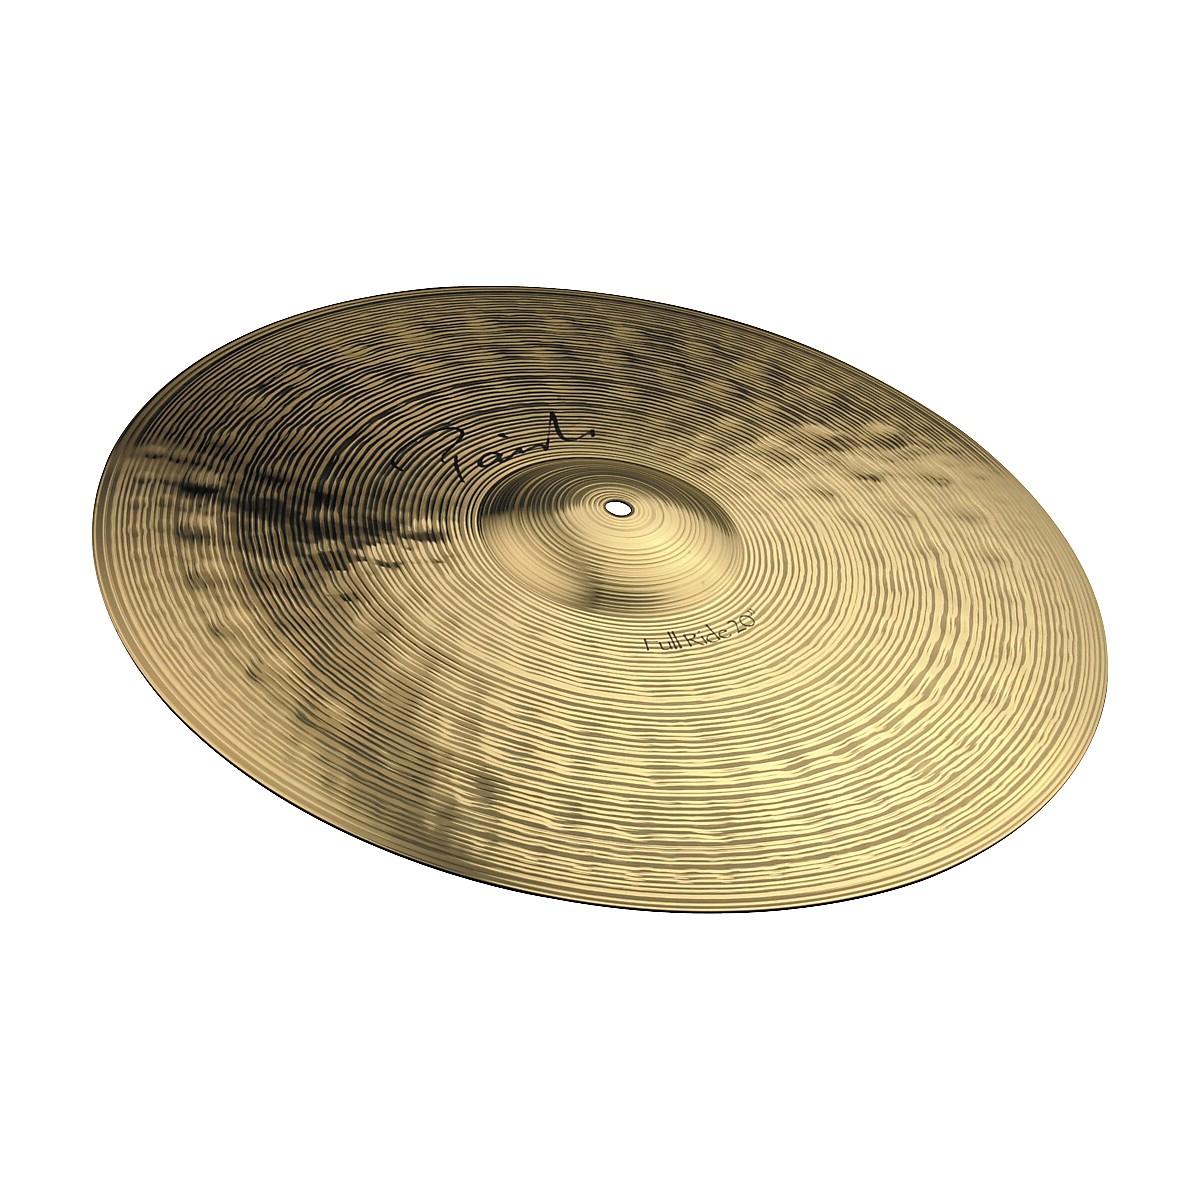 Paiste Signature Full Ride Cymbal